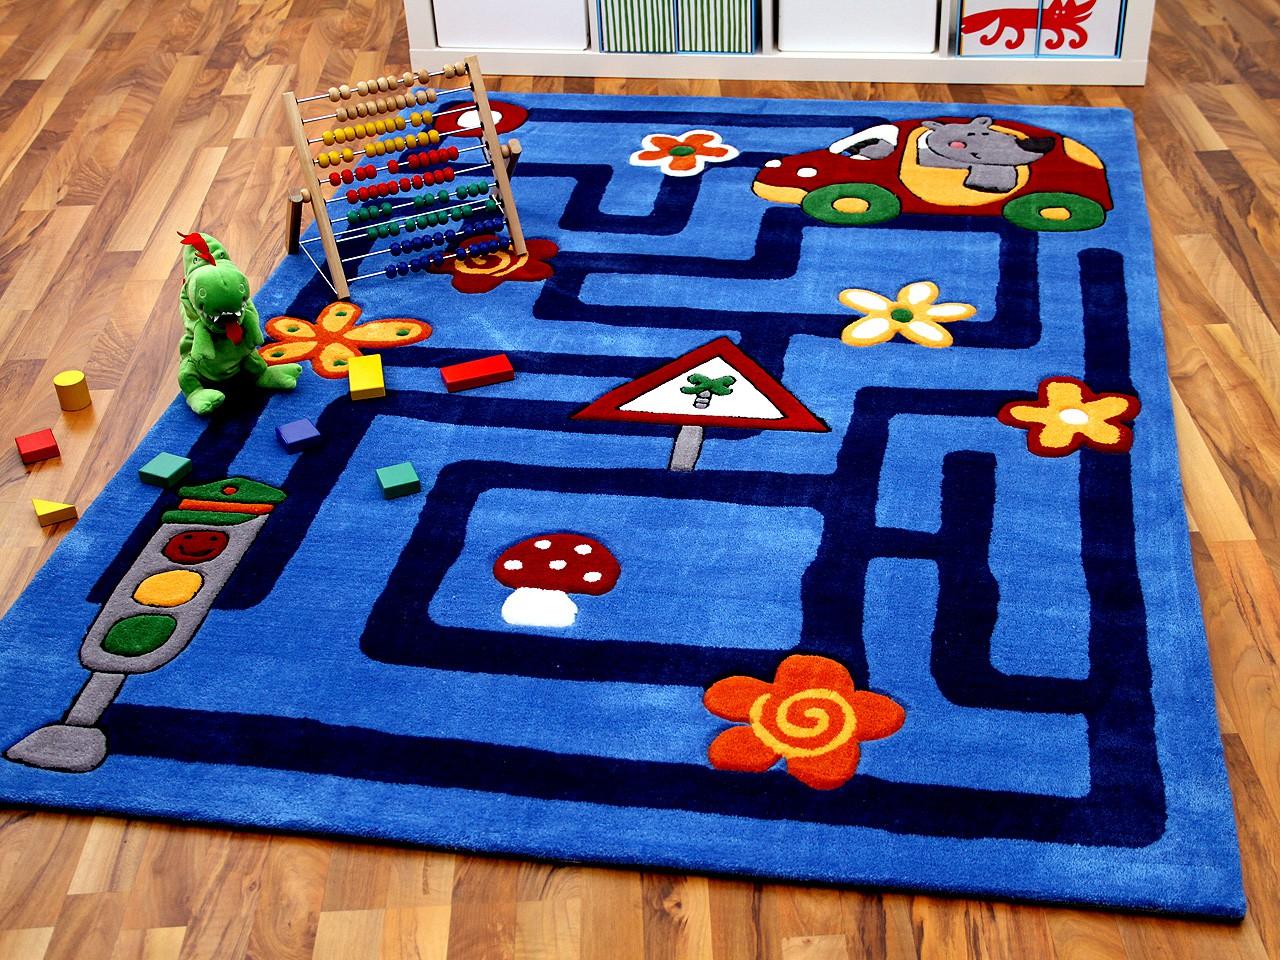 Kinderteppich blau  Lifestyle Kinderteppich Labyrinth Blau !!! Sofort Lieferbar !!! | eBay